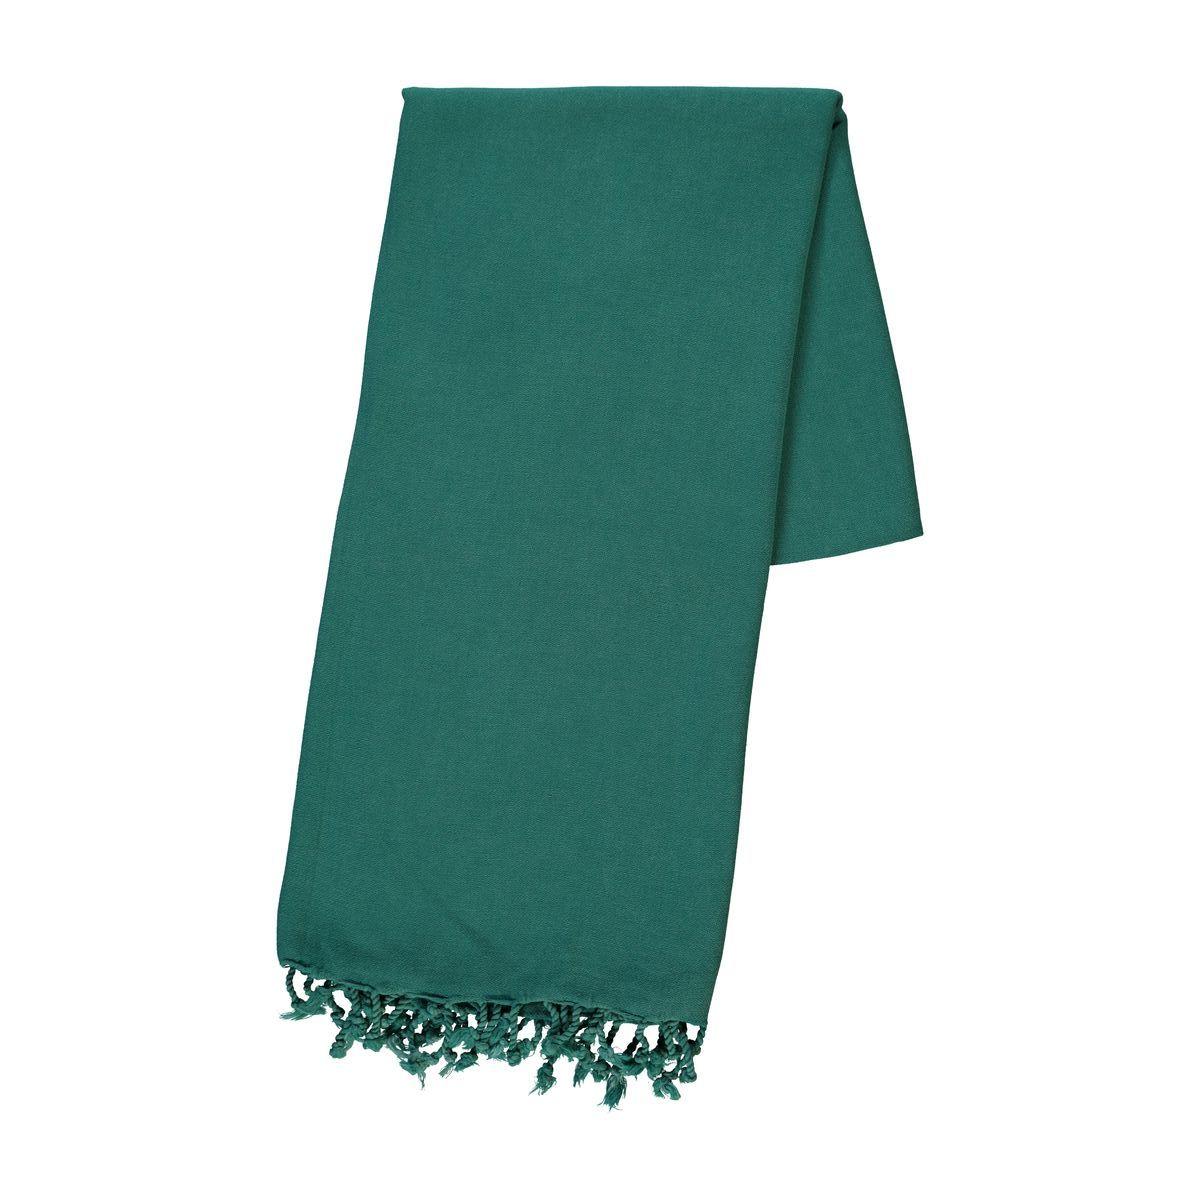 Peştemal Taş Sultan - Fanfare Yeşil